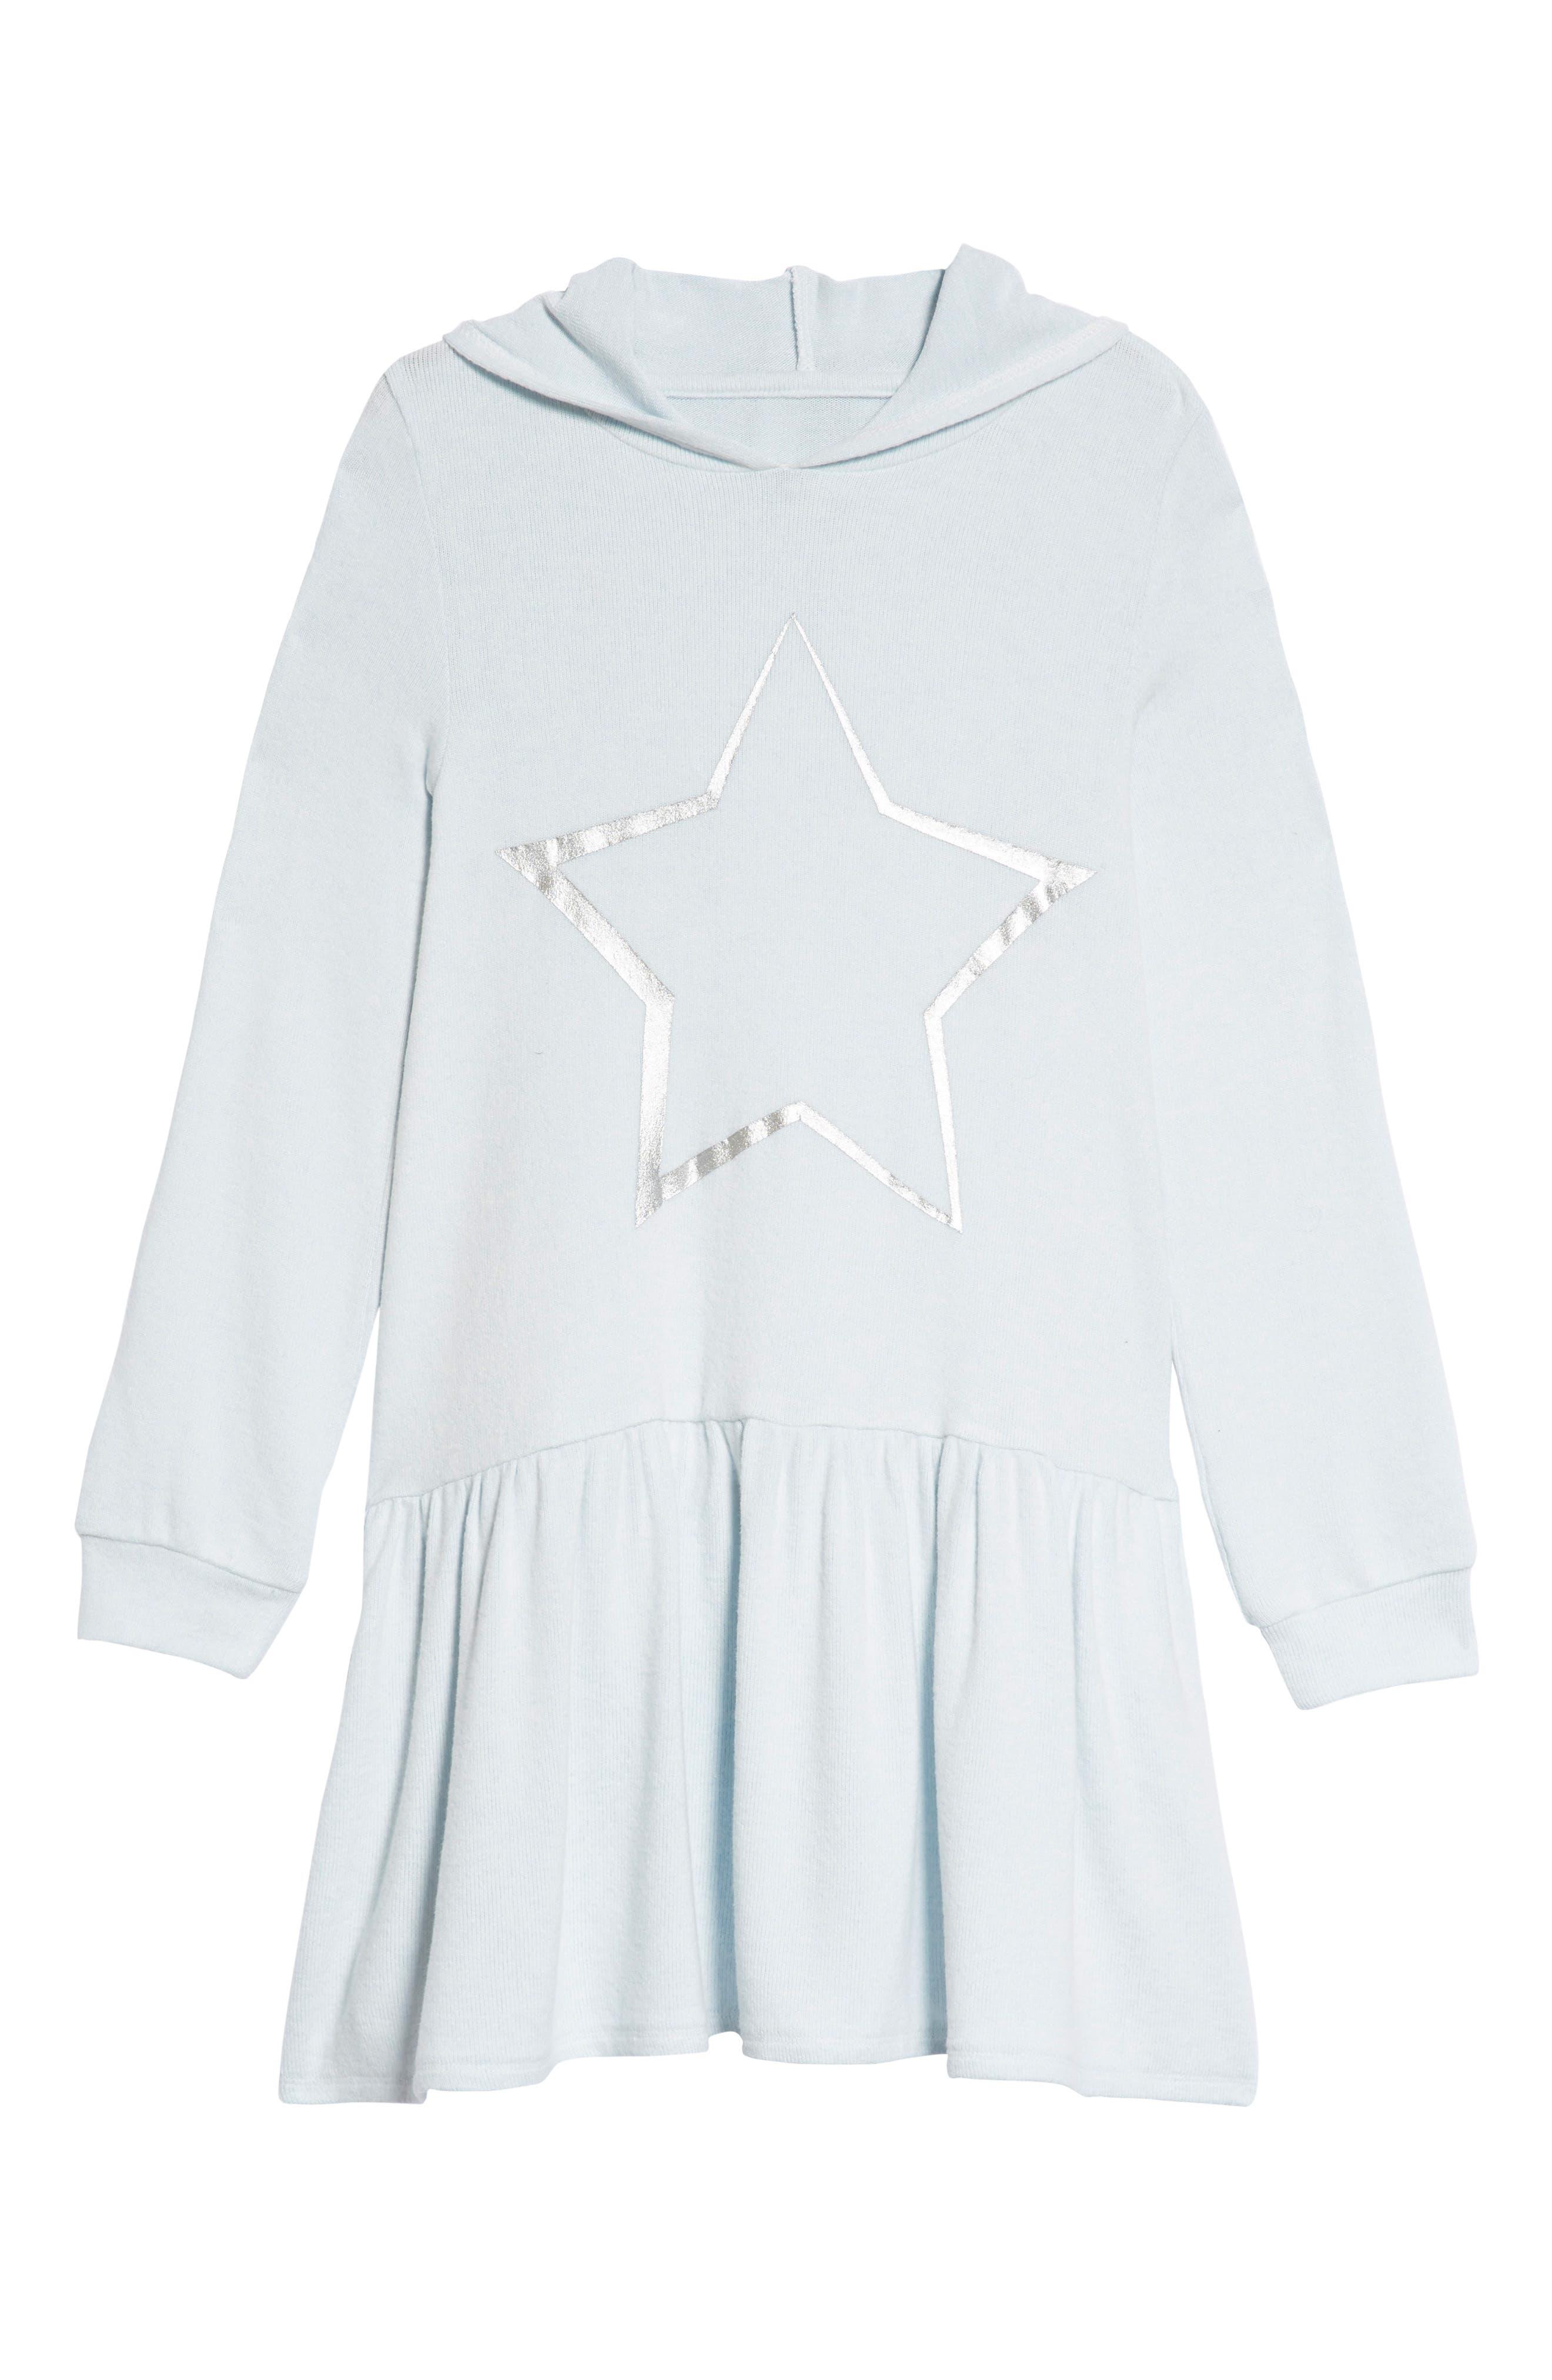 Cozy Hooded Dress,                             Main thumbnail 1, color,                             Blue Drift Star